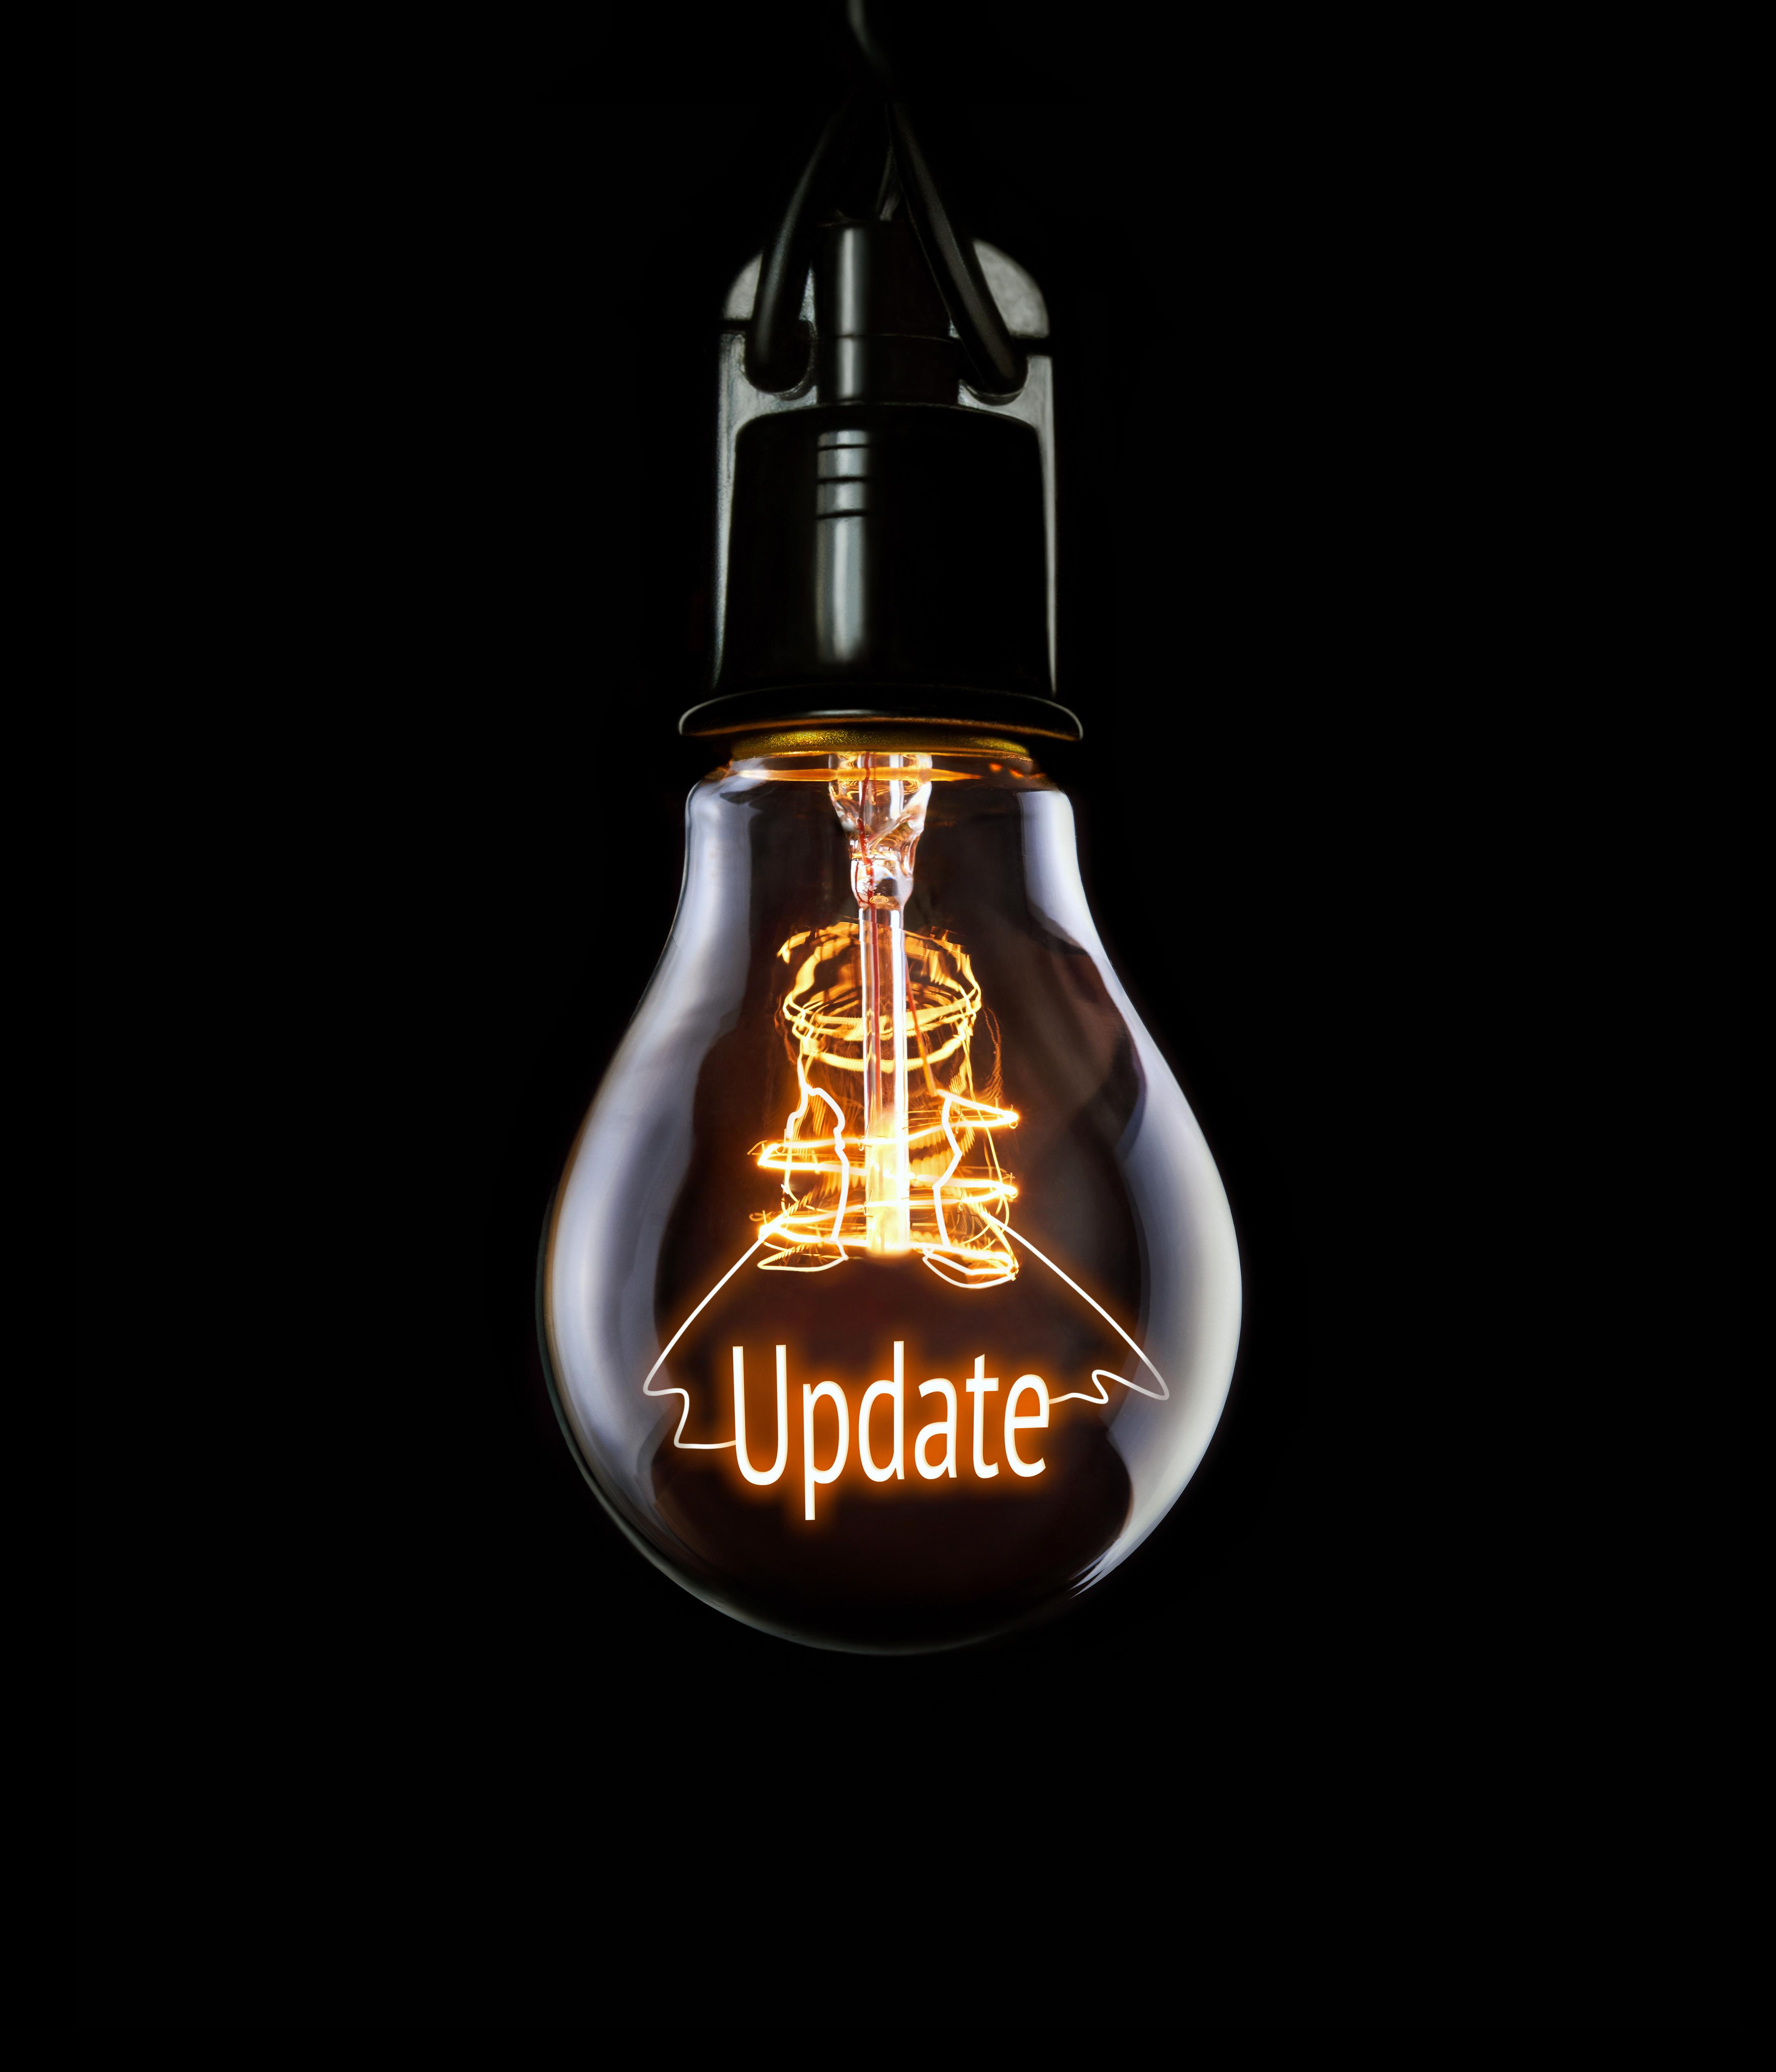 Halogen to LED Upgrade